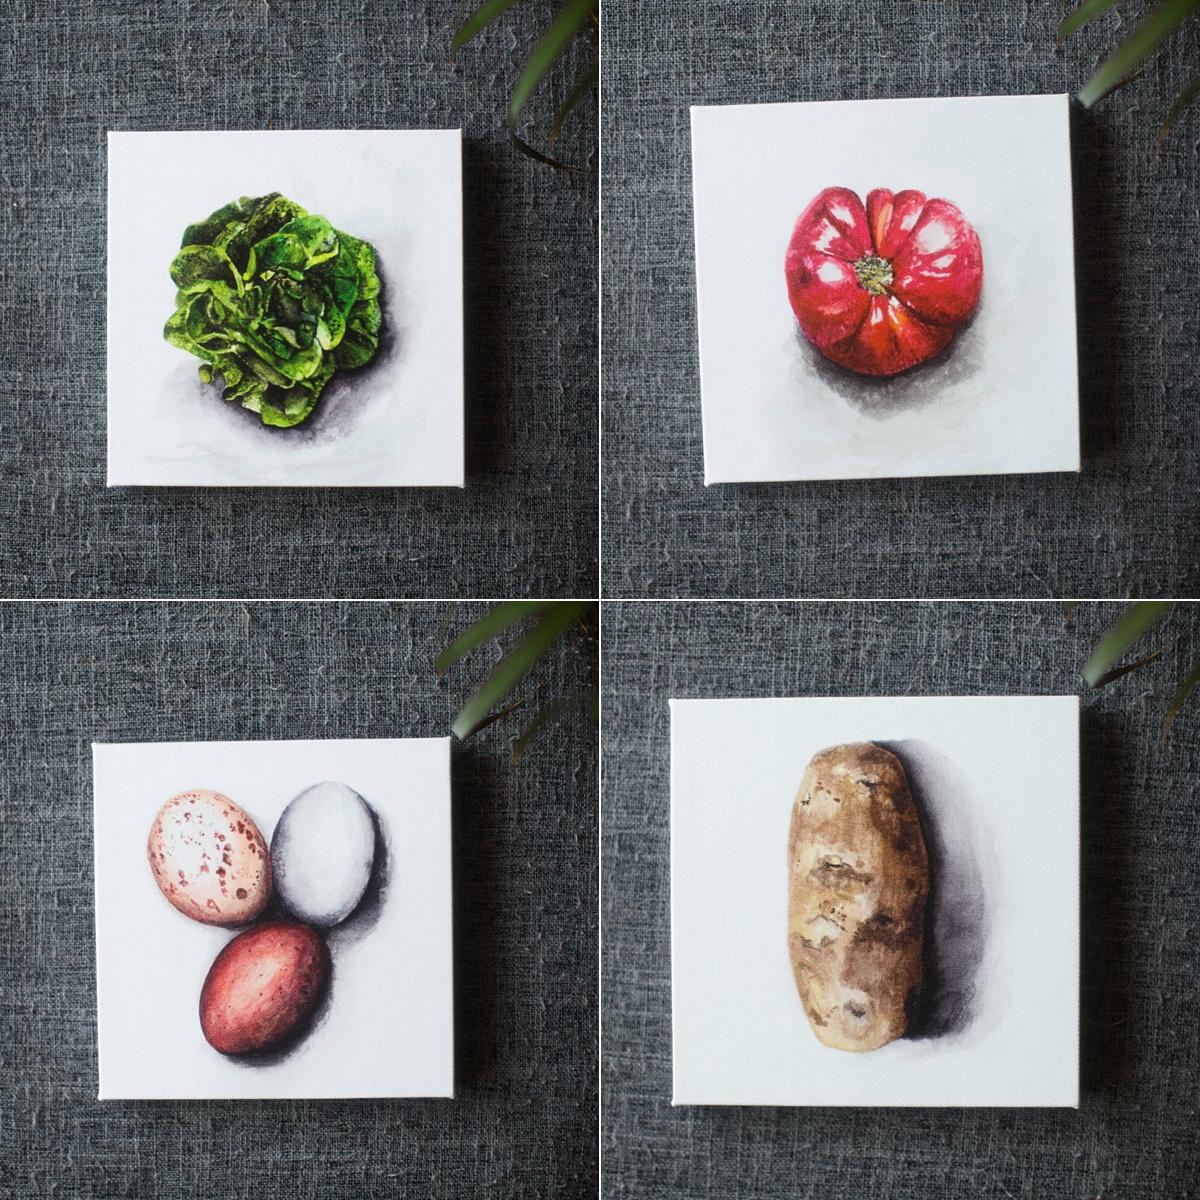 Watercolor Greens Potatoe Tomatoe Eggs_0014.jpg